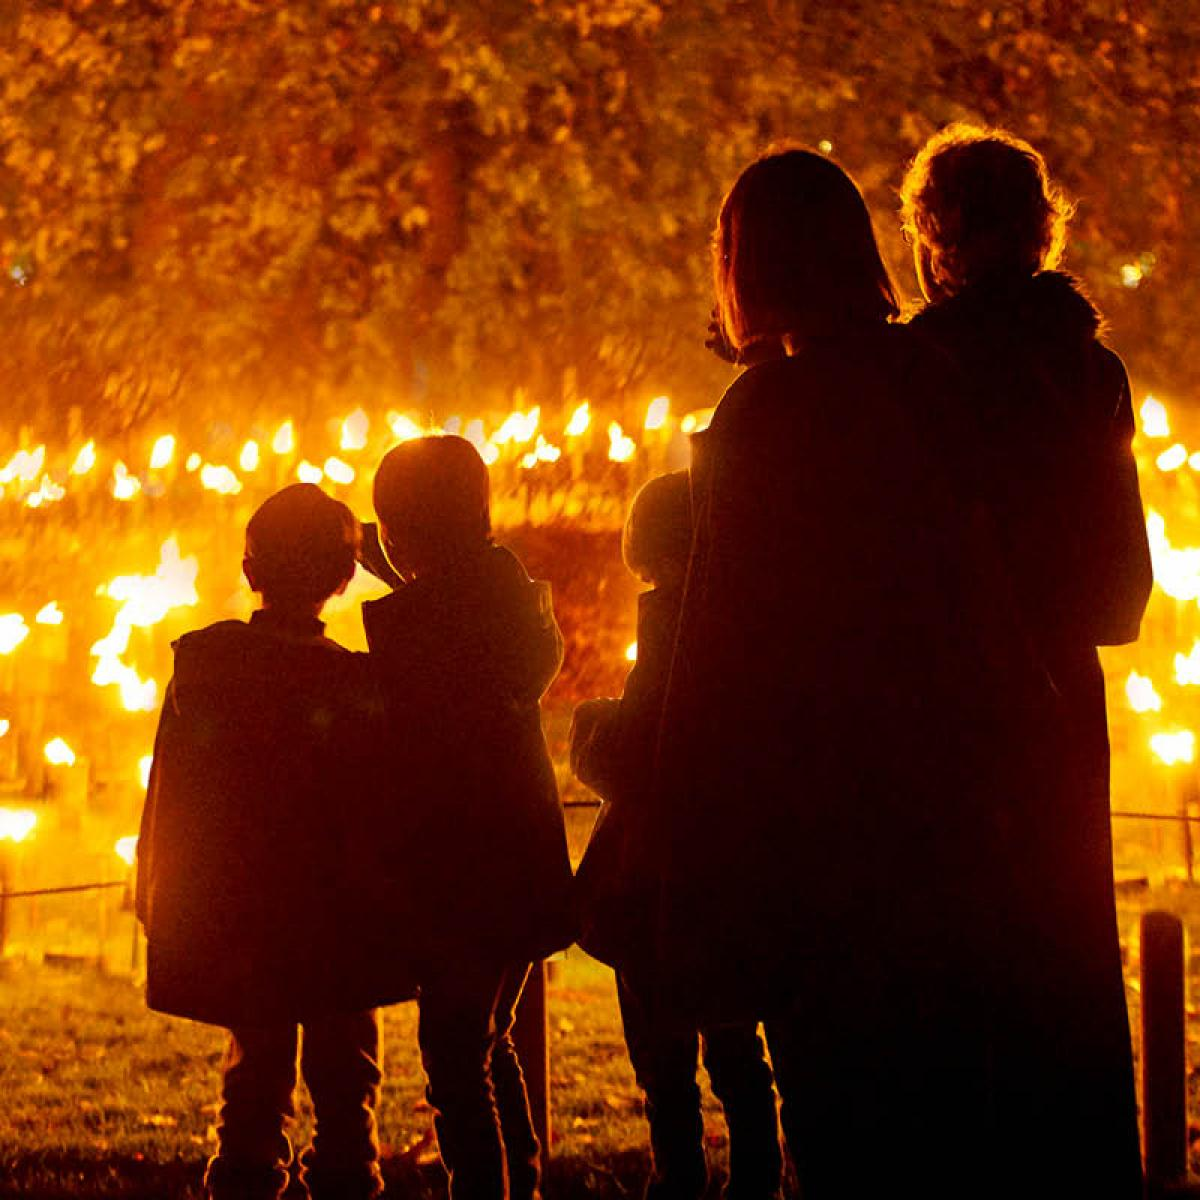 Blenheim Palace Illuminated Light Trail 2020 - Slider Image 2